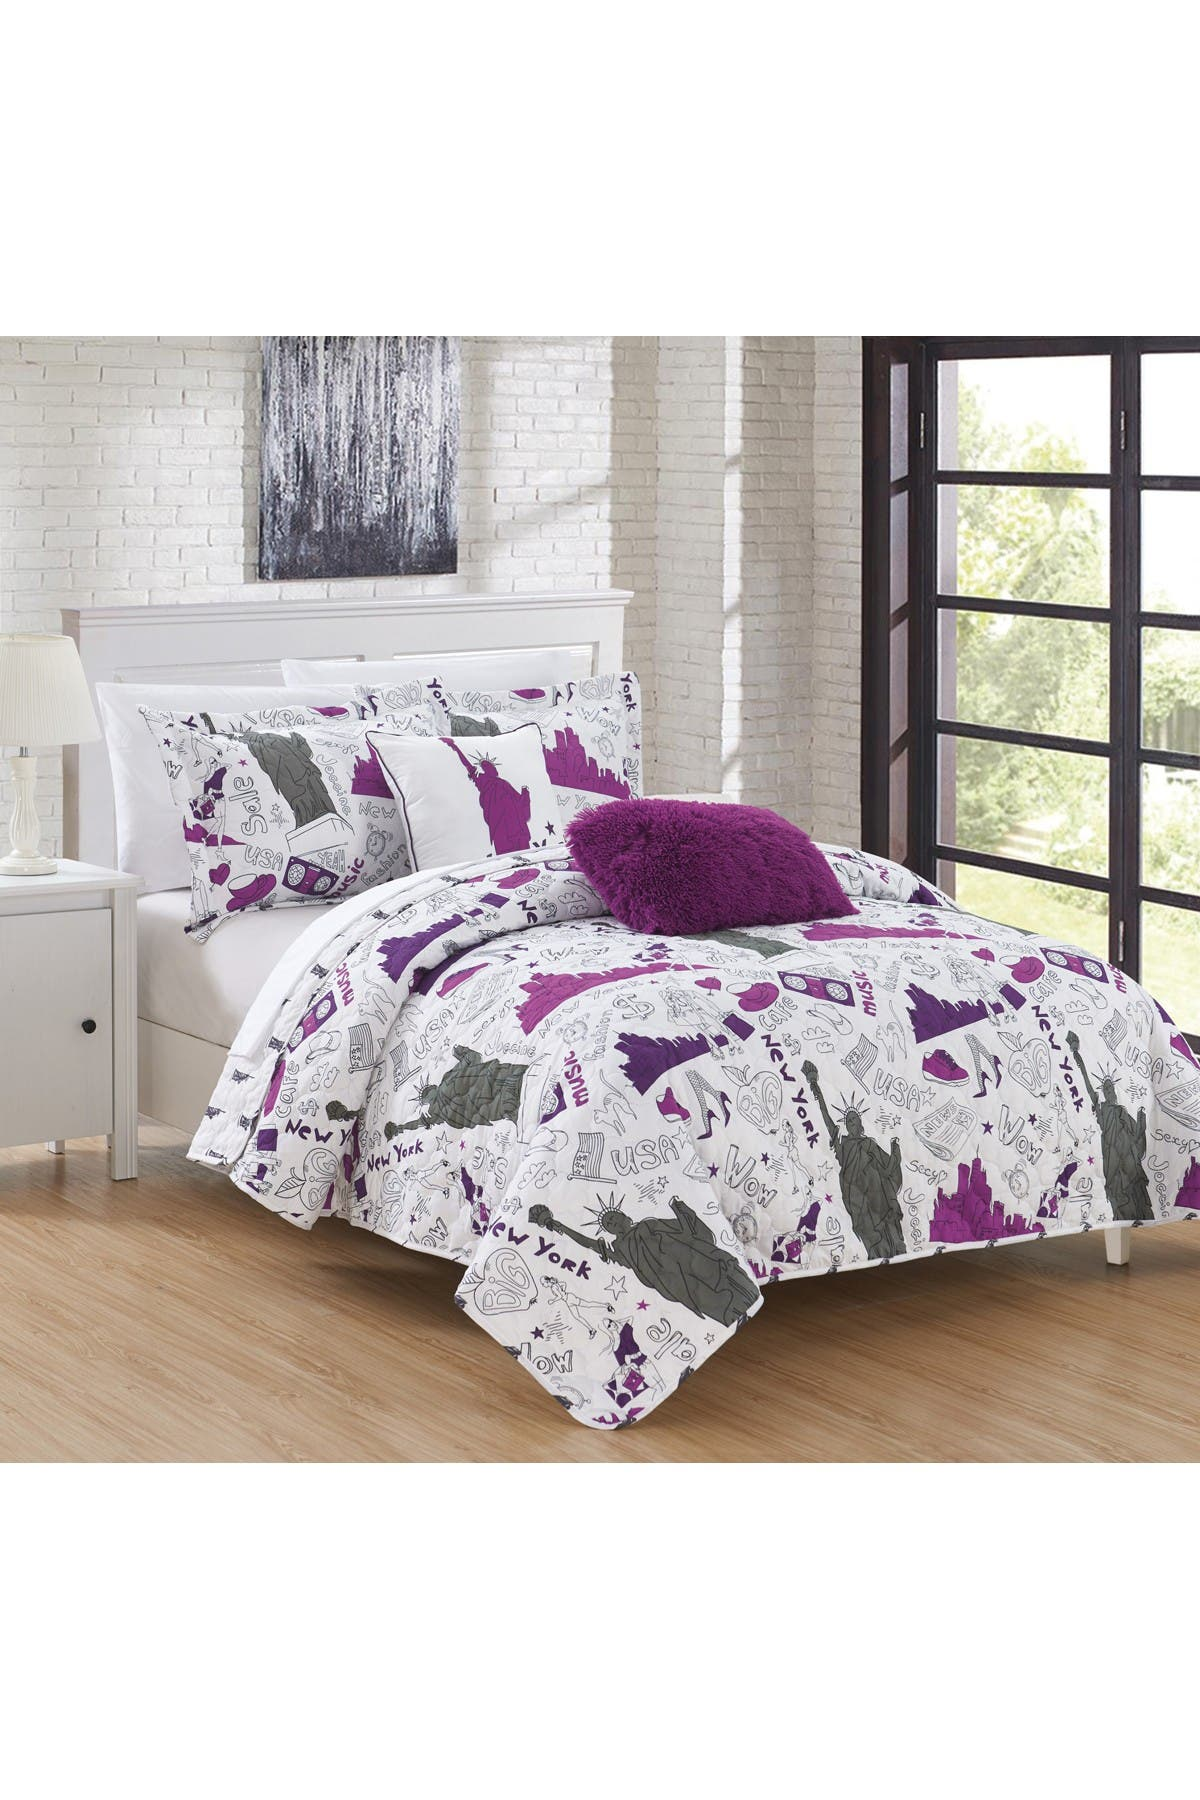 Image of Chic Home Bedding Full Fulton Reversible New York Theme Quilt Set - Purple